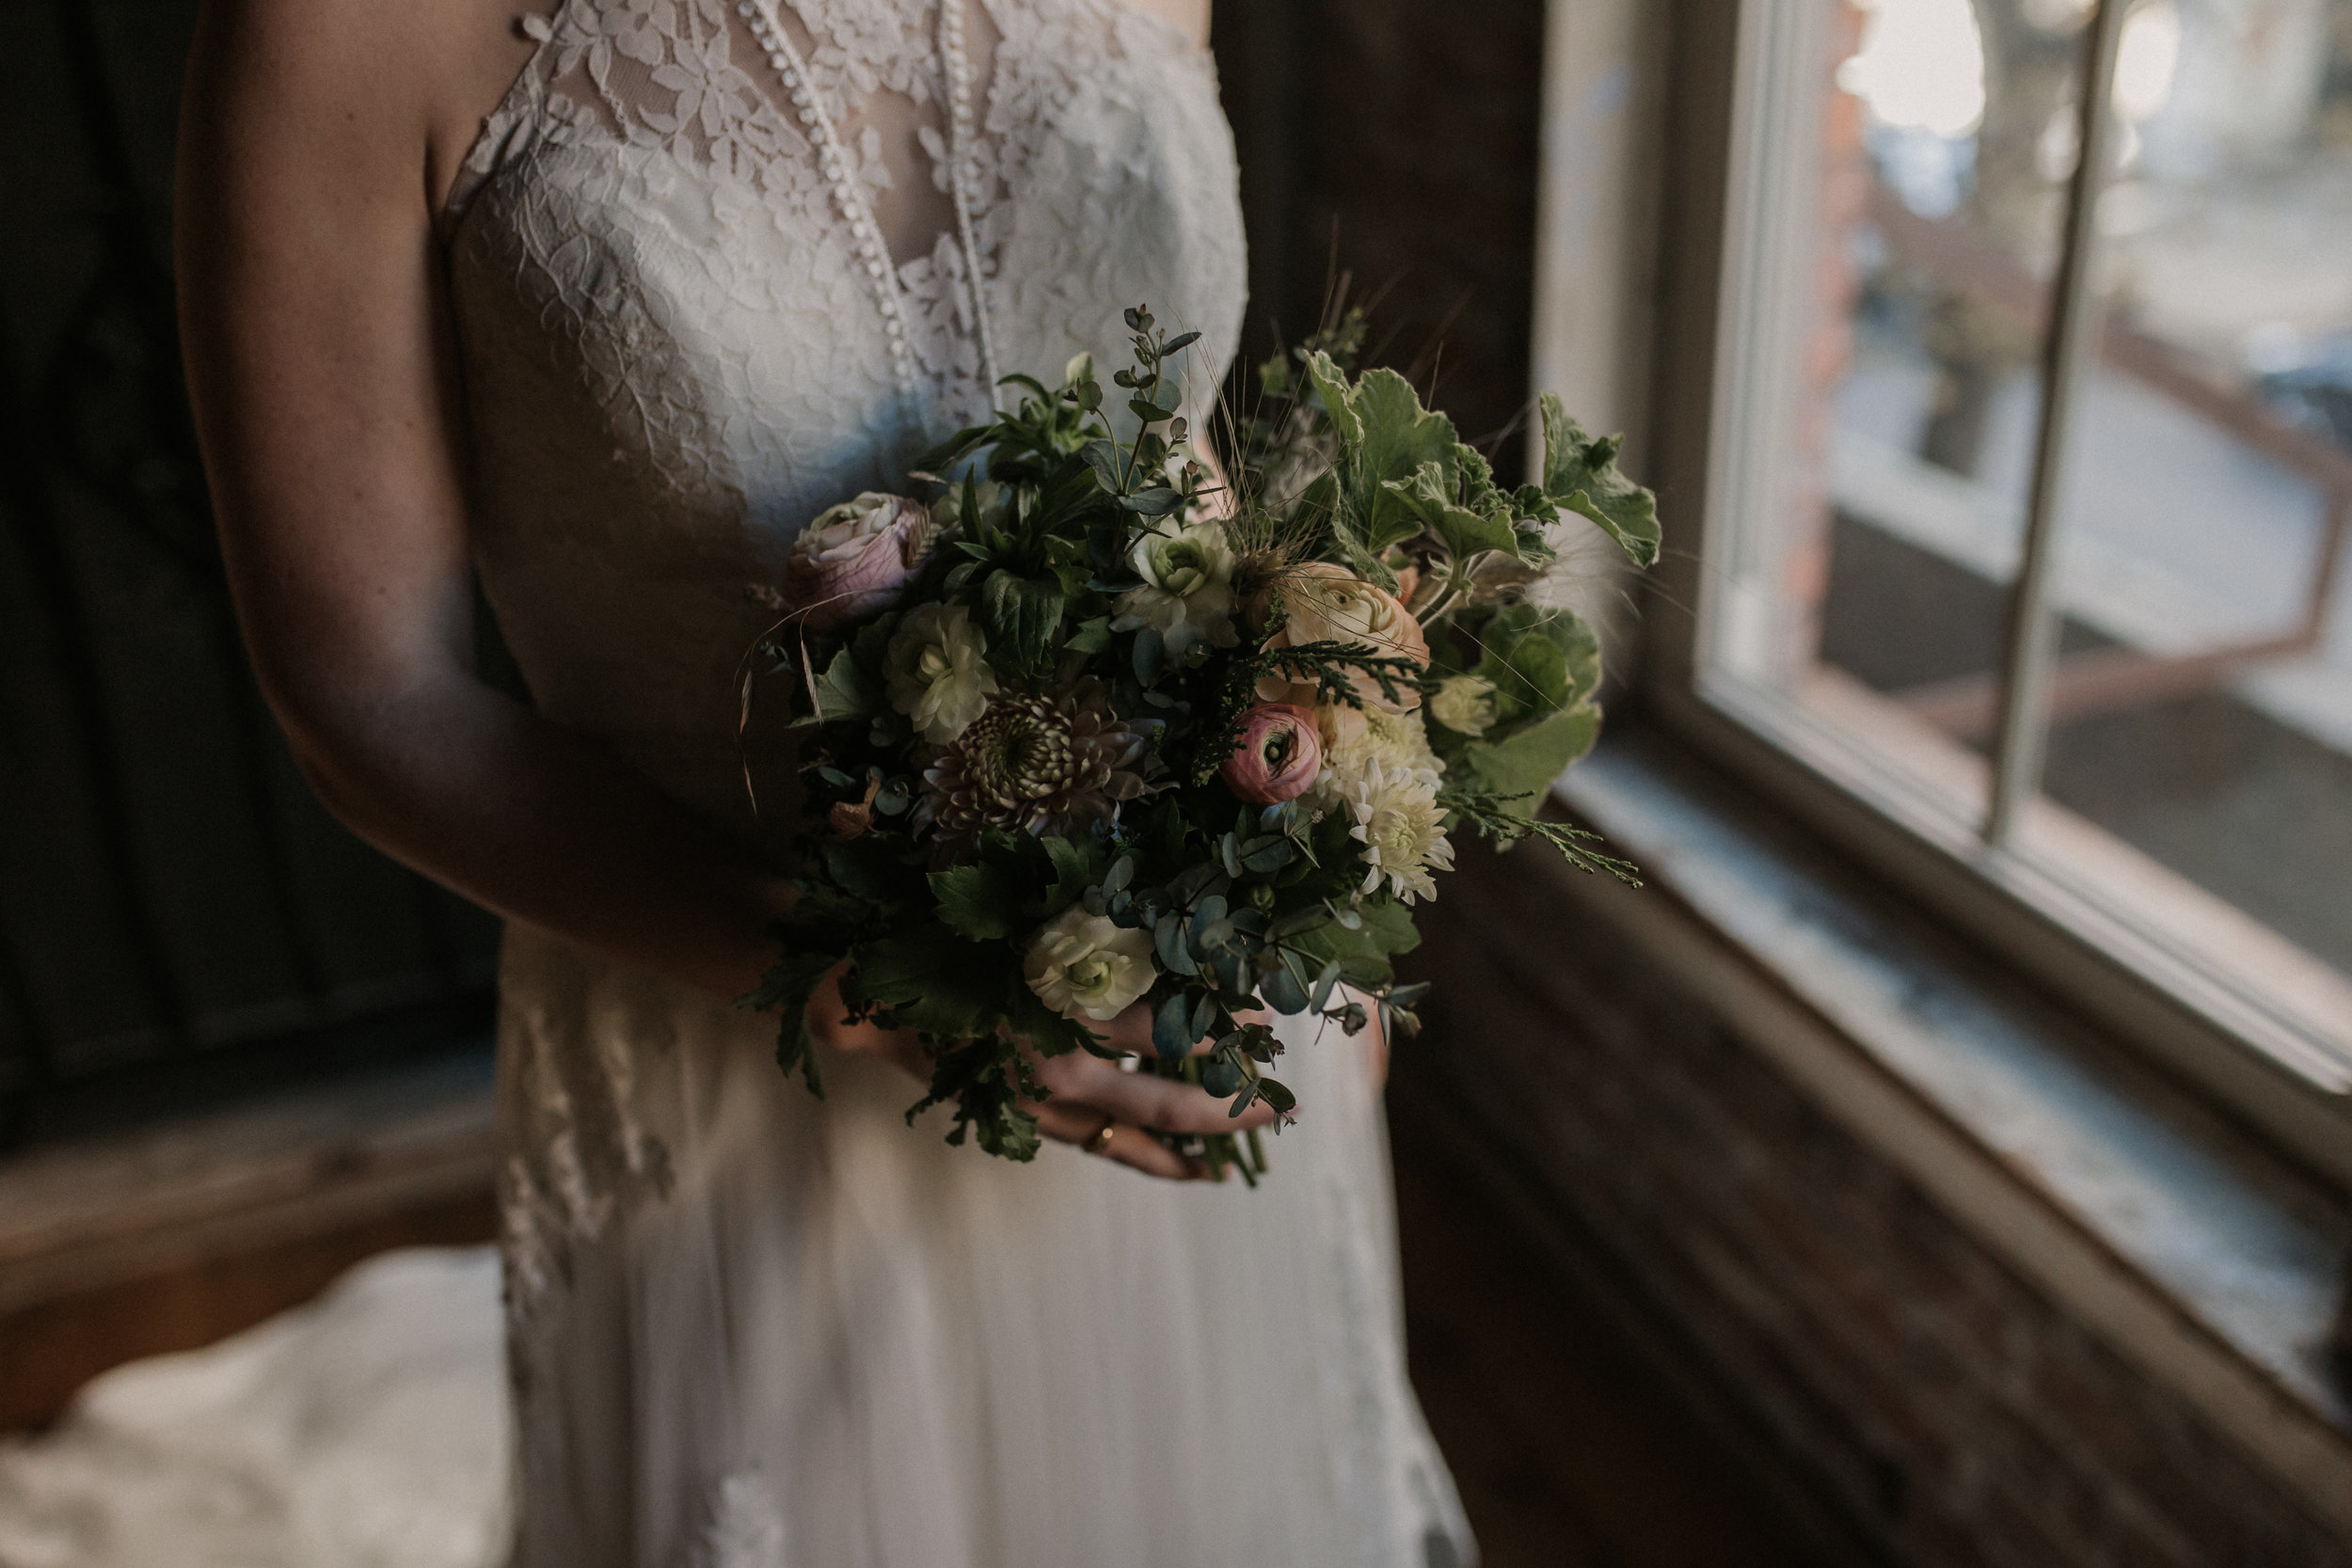 lucas_confectionery_wedding_016.JPG